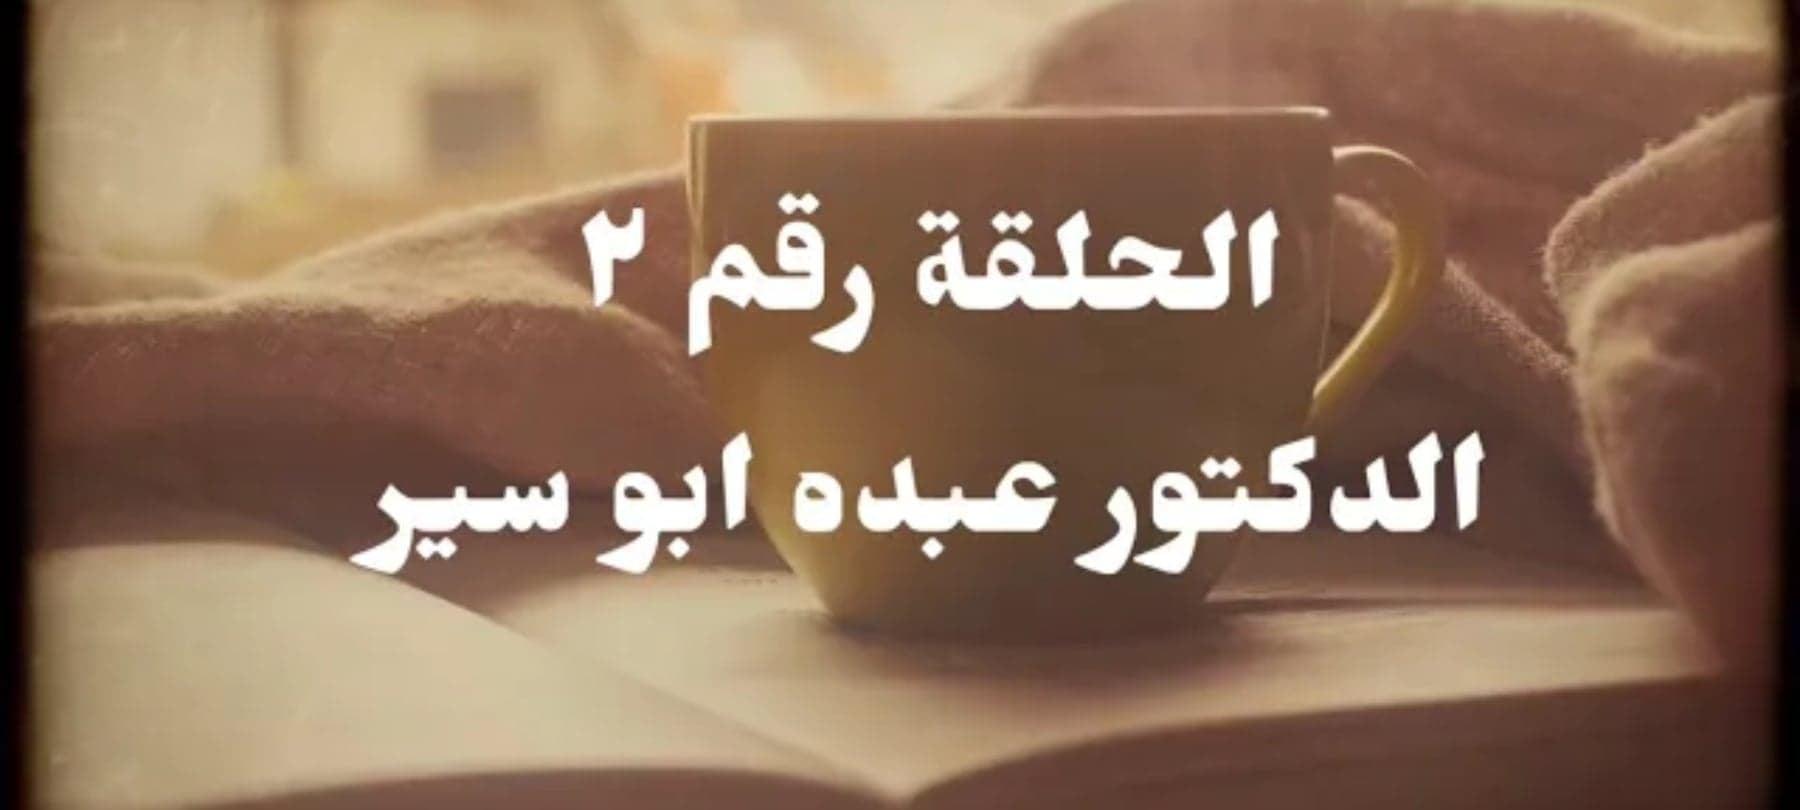 حكايتي الحلقة 02 (د. عبده ابو سير) – My story 2(ِD. Abdo Abu Seir)